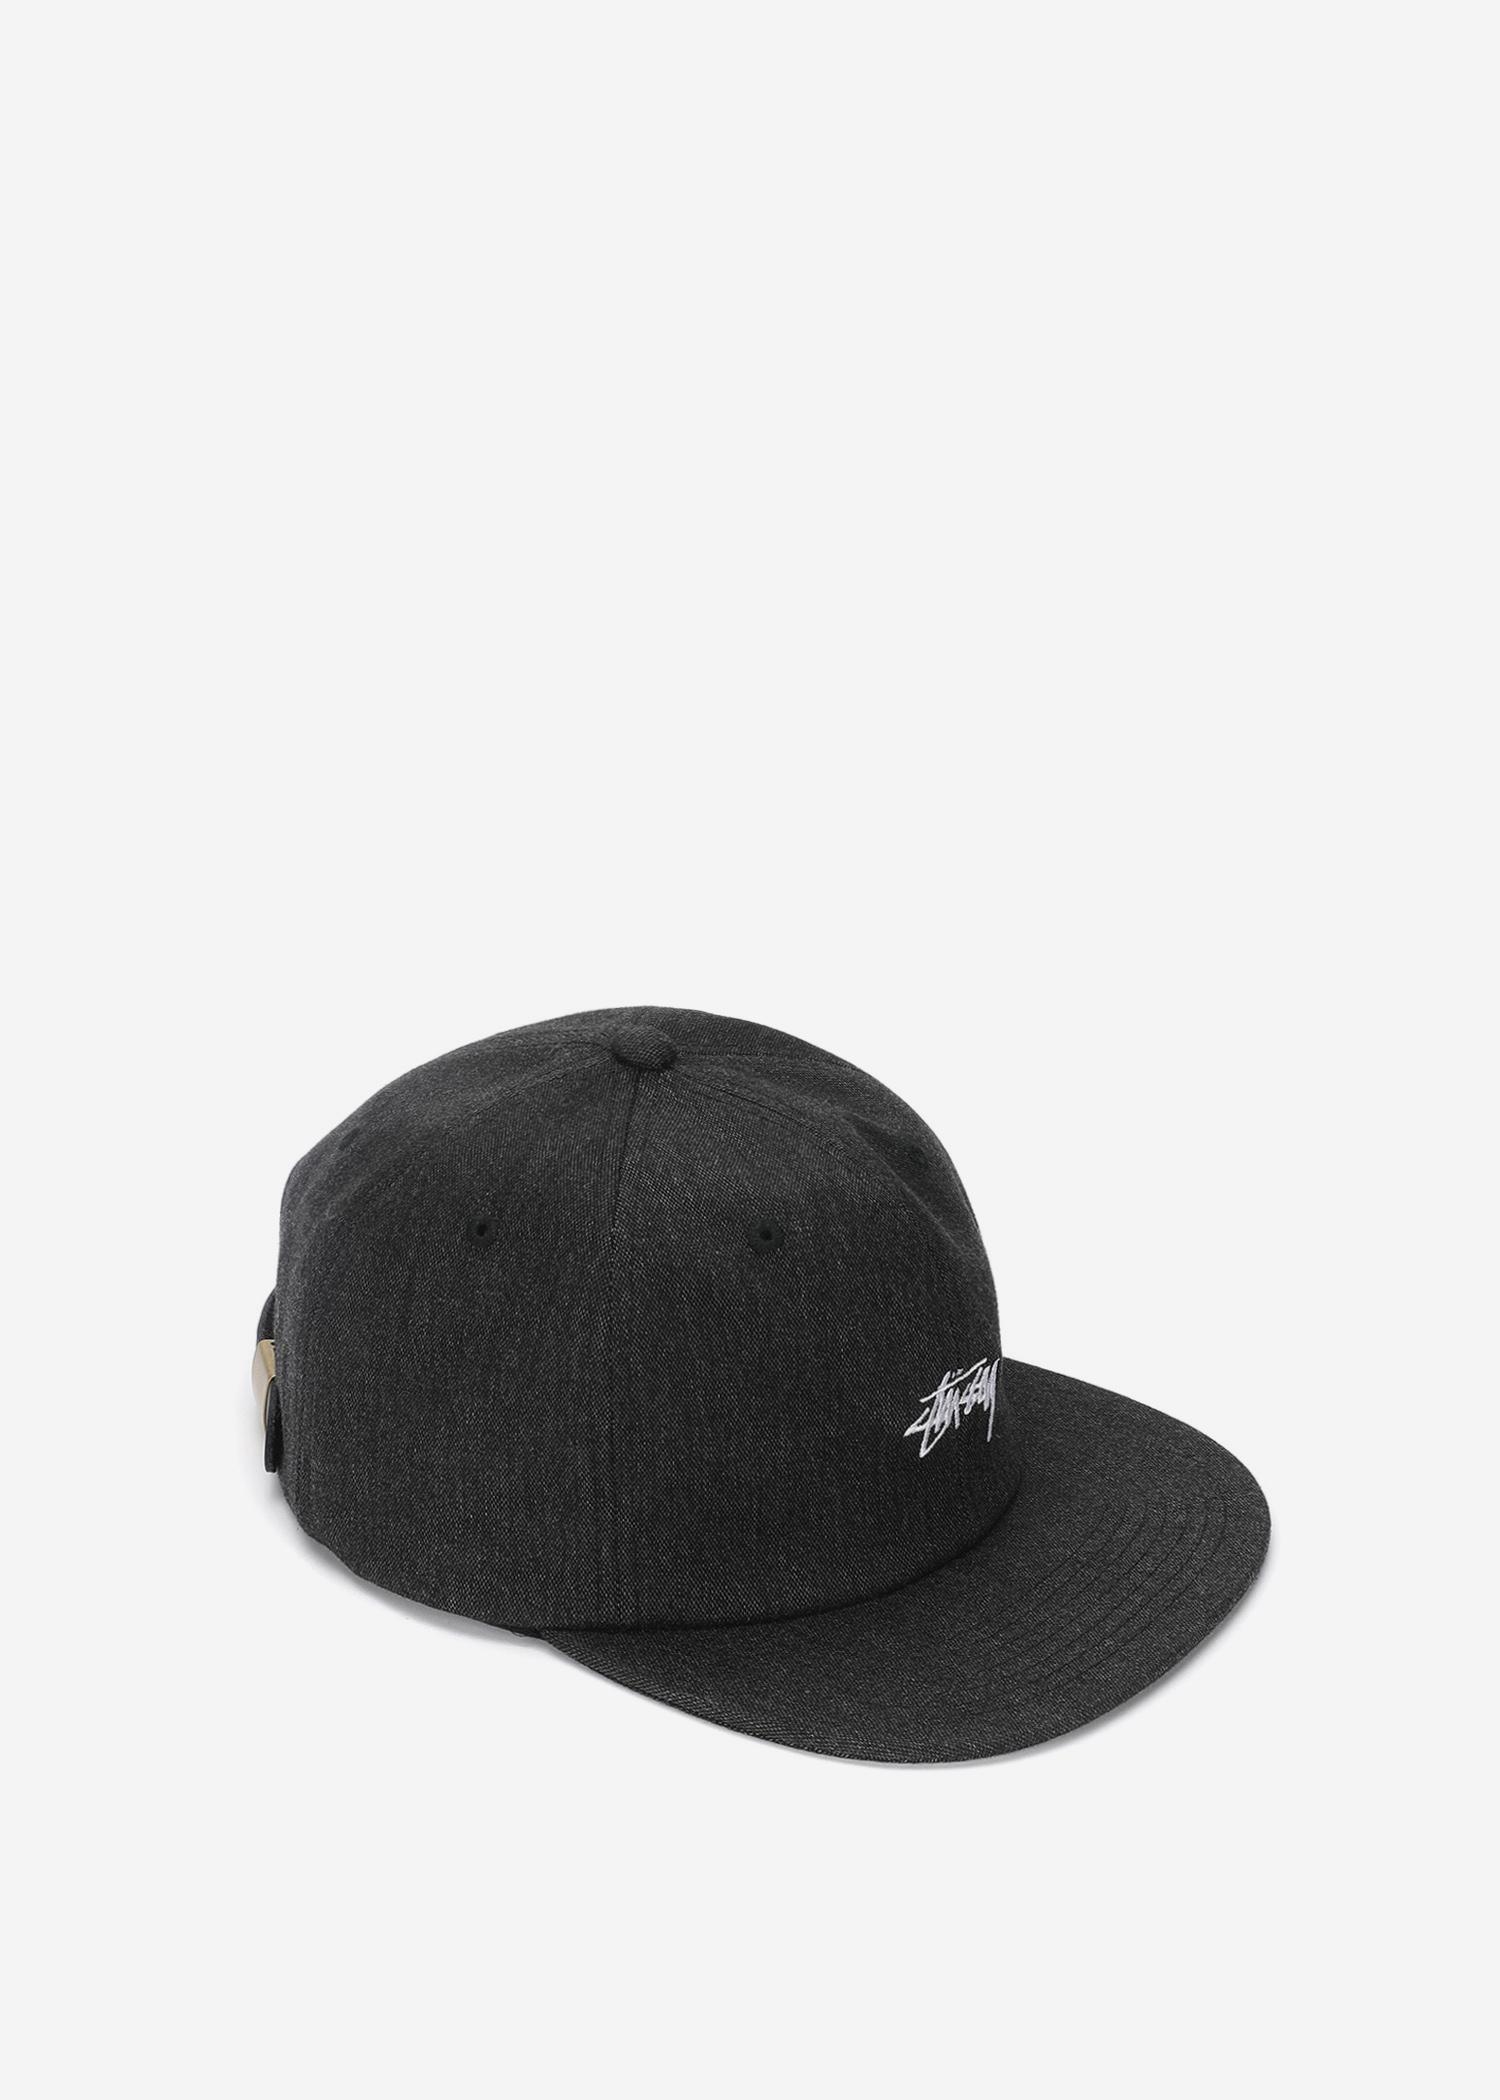 25c4bf4cf5132 Lyst - Stussy Melange Denim Strapback Cap in Black for Men